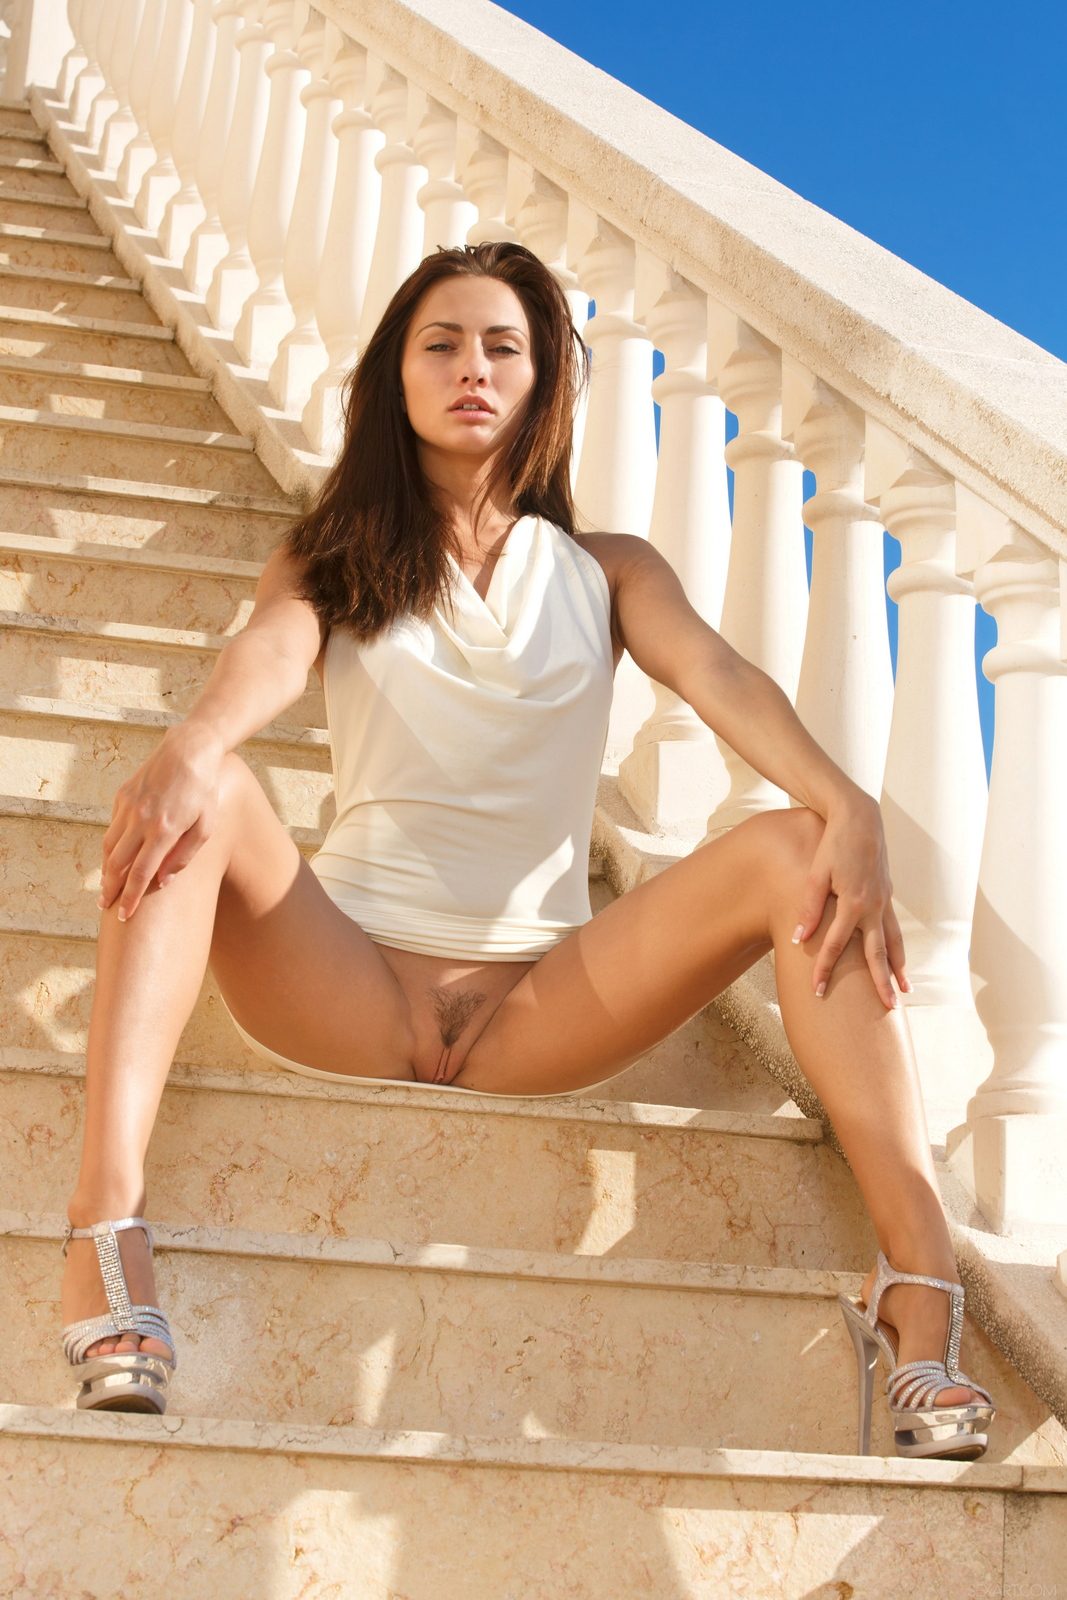 michaela-isizzu-stairs-high-heels-naked-sexart-07